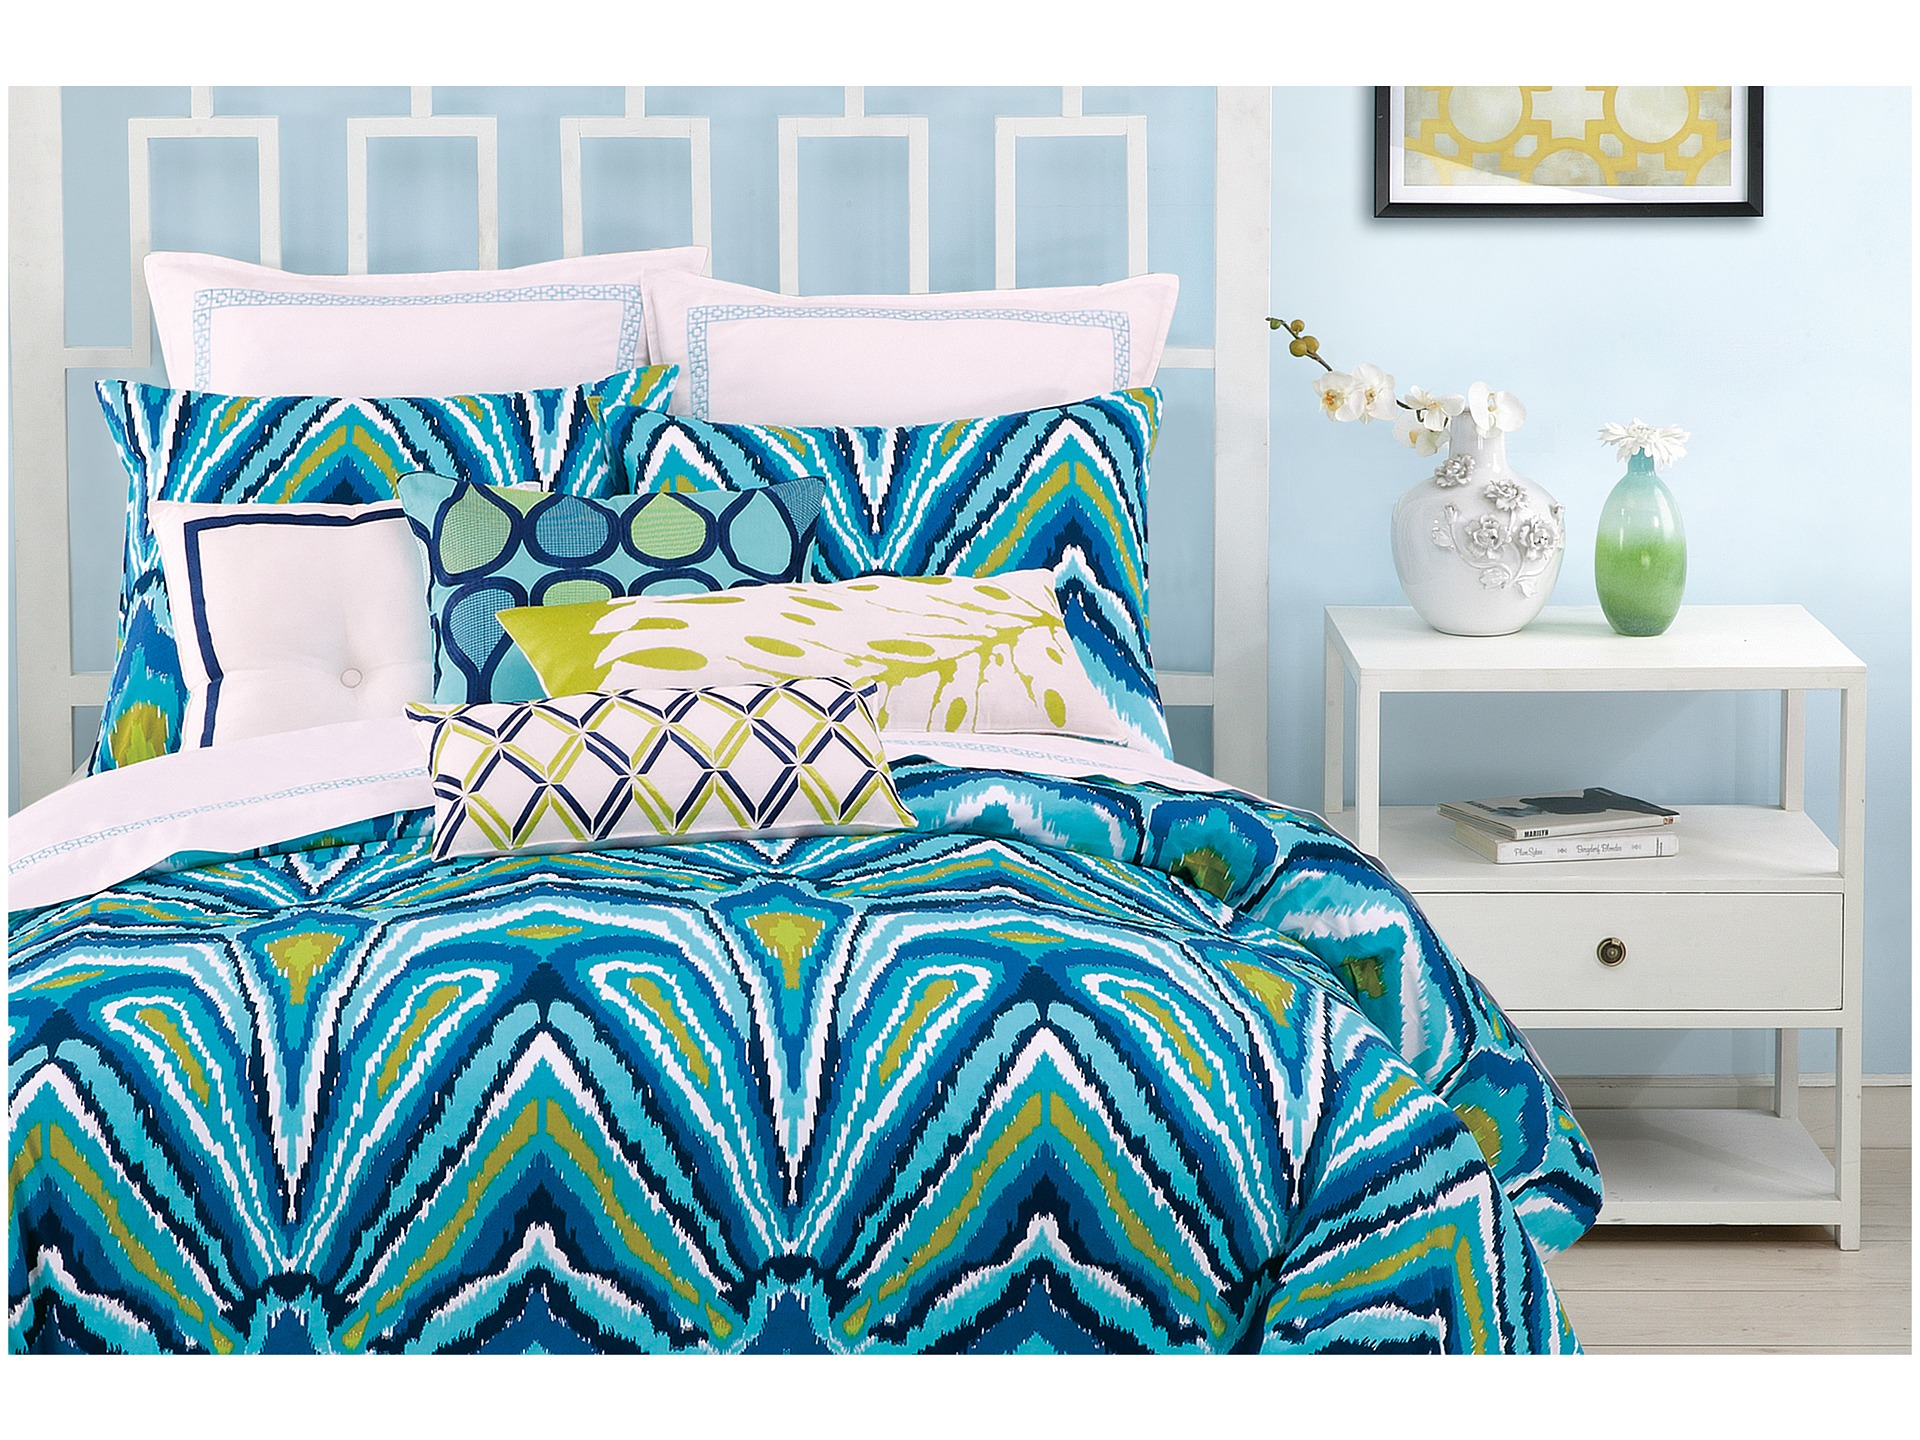 Trina Turk Blue Peacock Comforter Set King